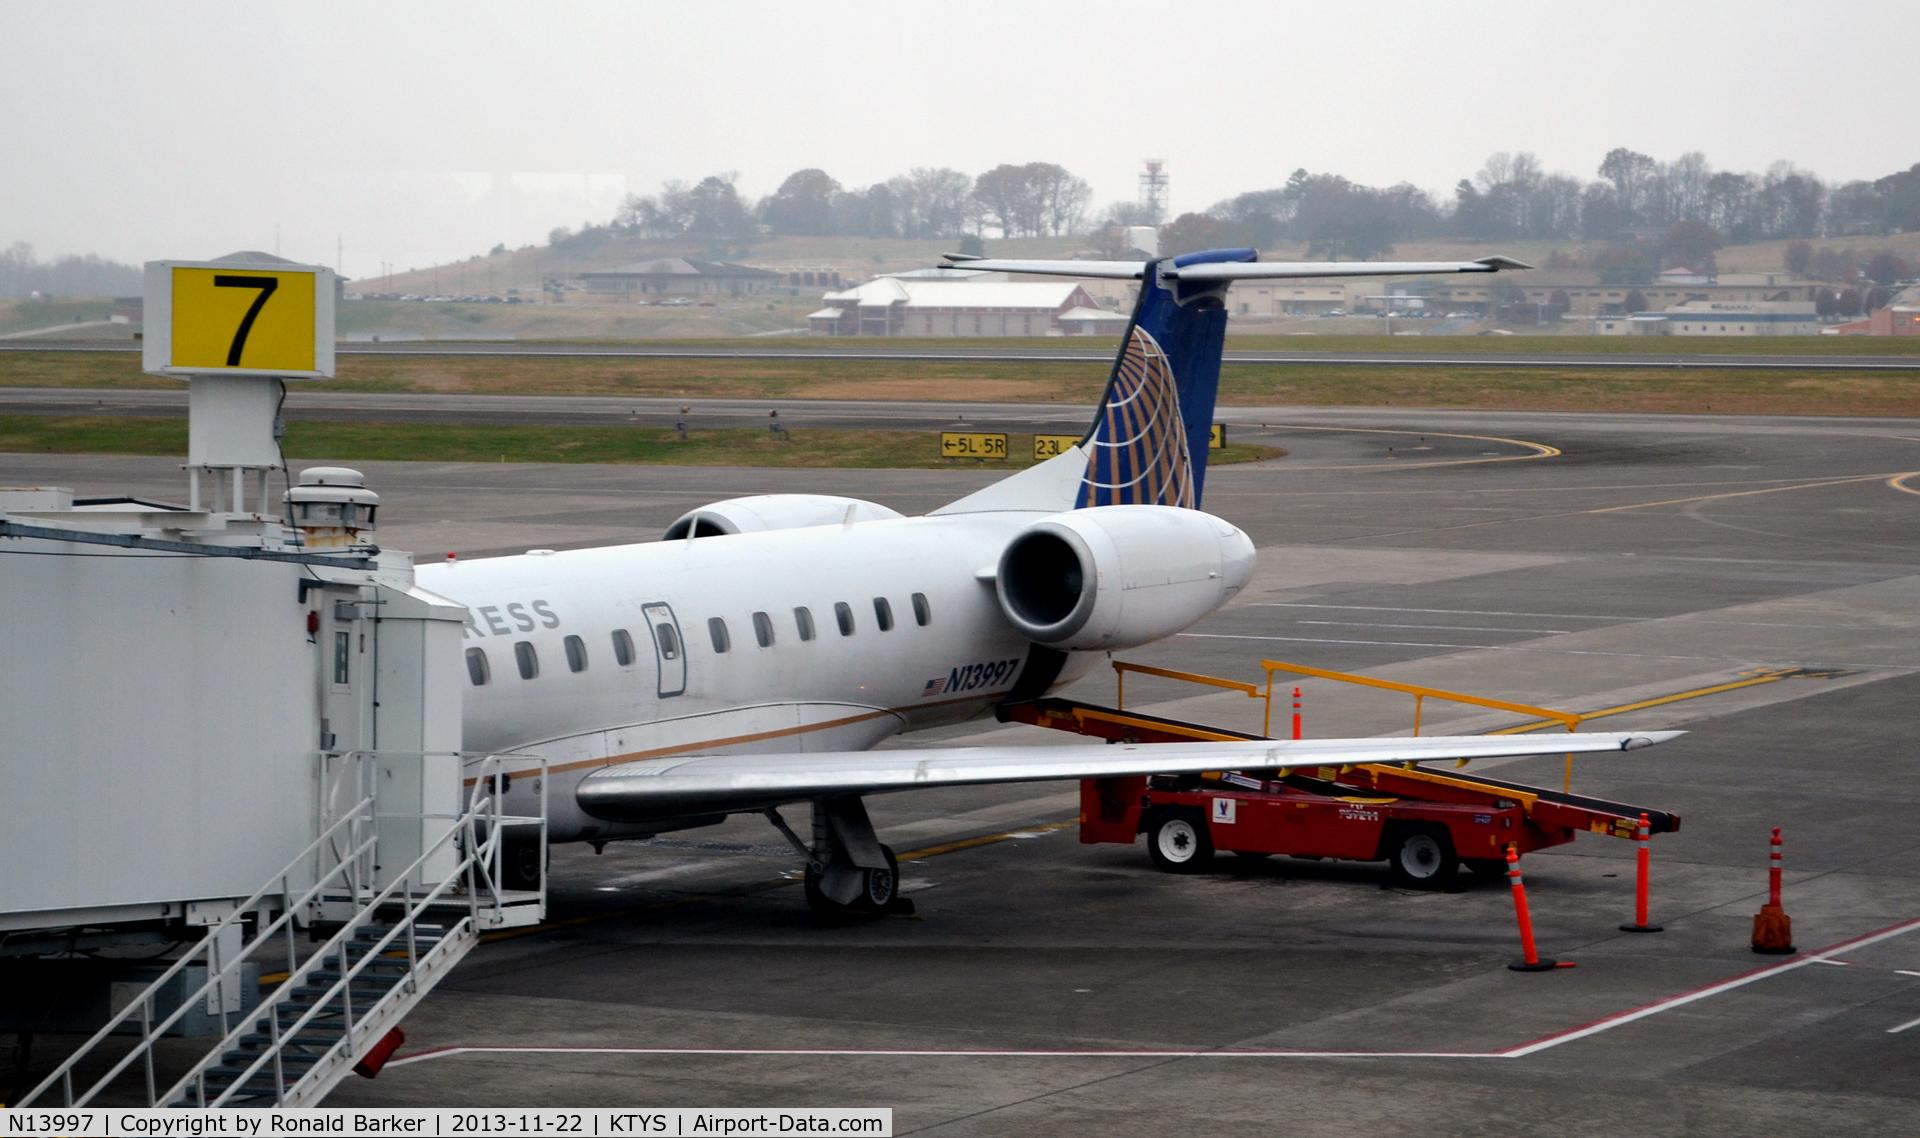 N13997, 2000 Embraer EMB-145LR (ERJ-145LR) C/N 145298, Gate 7 TYS